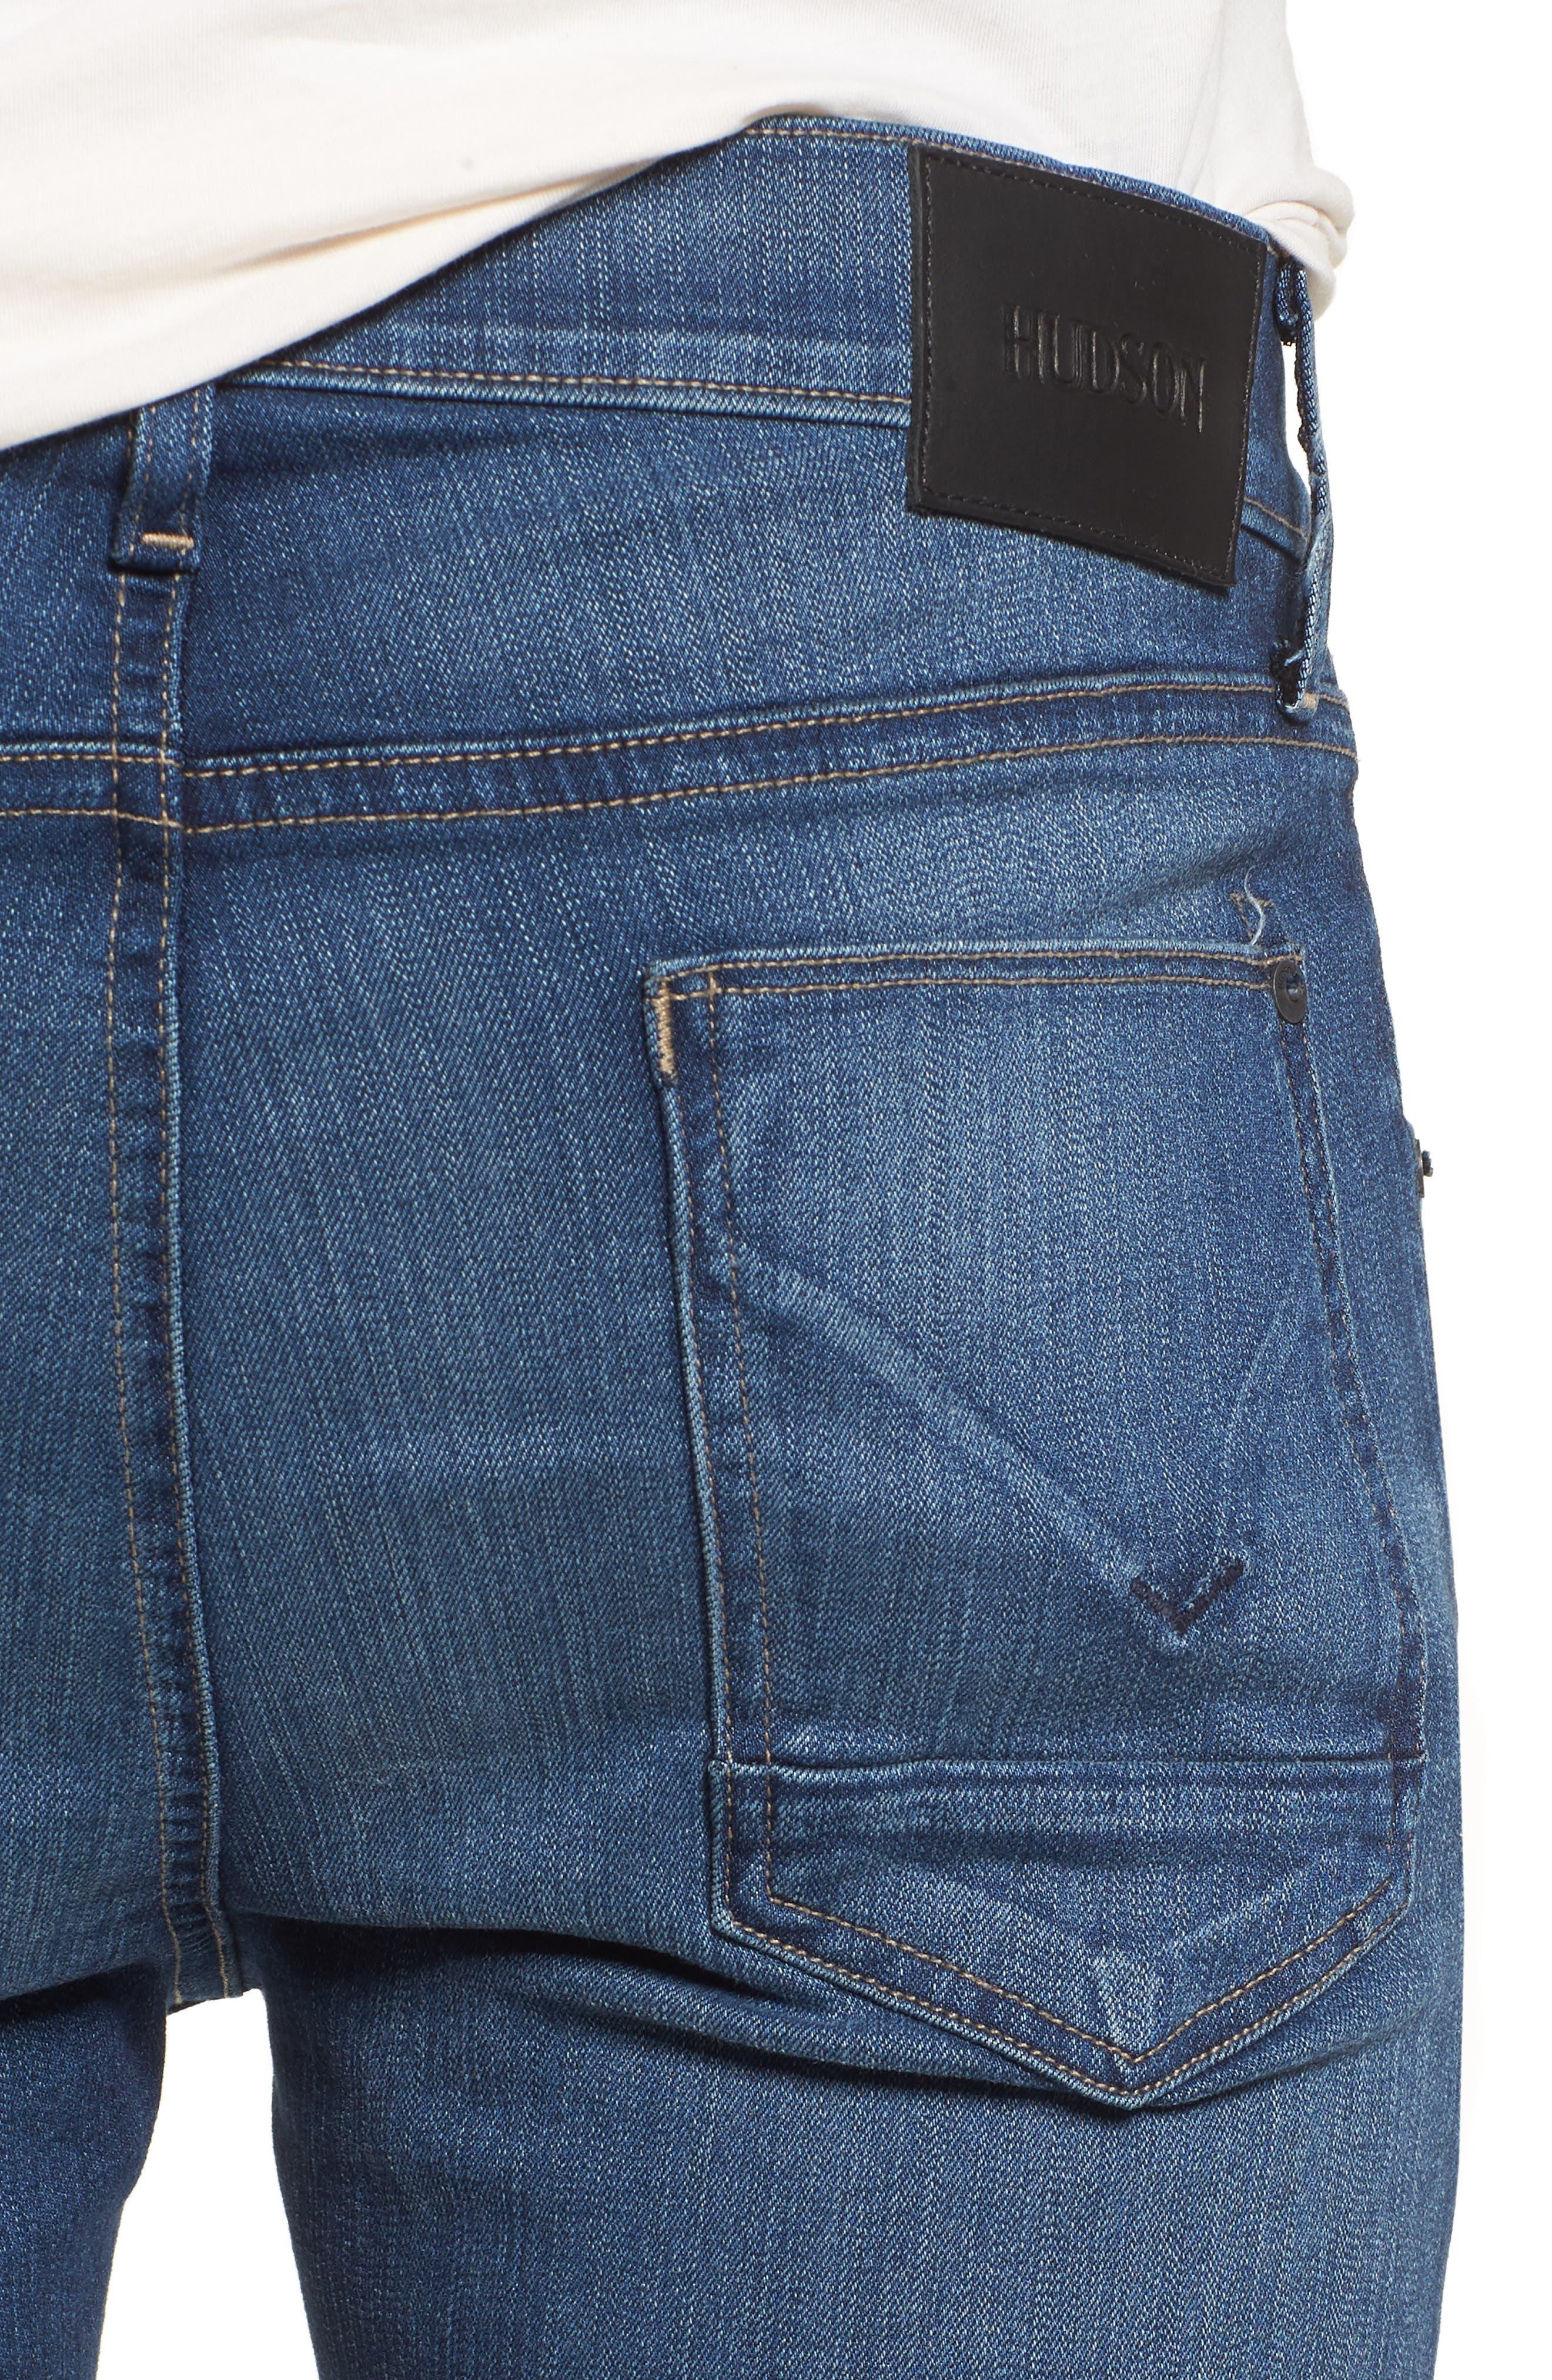 Hudson Blake Slim Fit Jeans,                             Alternate thumbnail 5, color,                             Independent